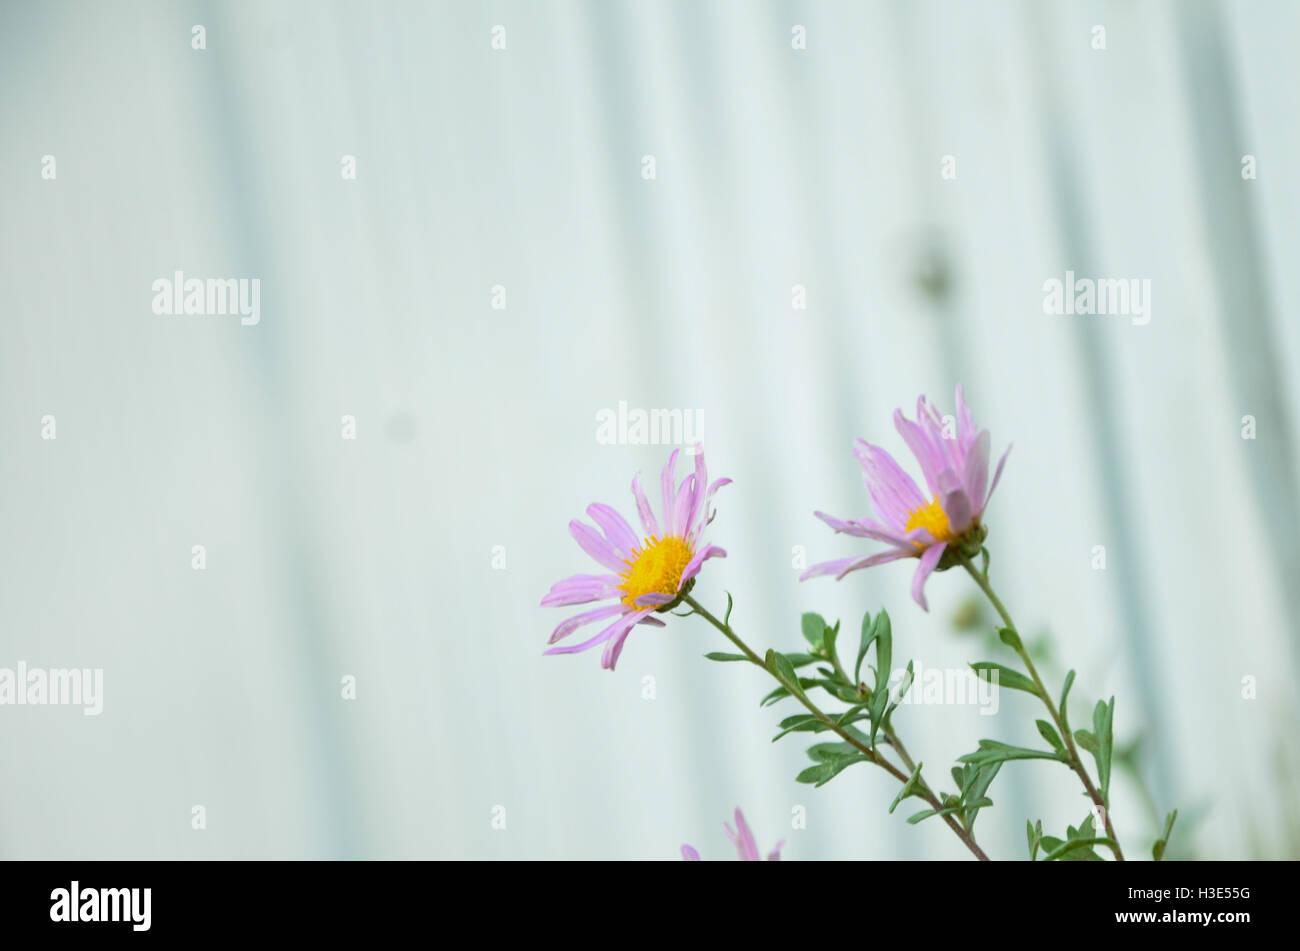 purple flower in the street - Stock Image